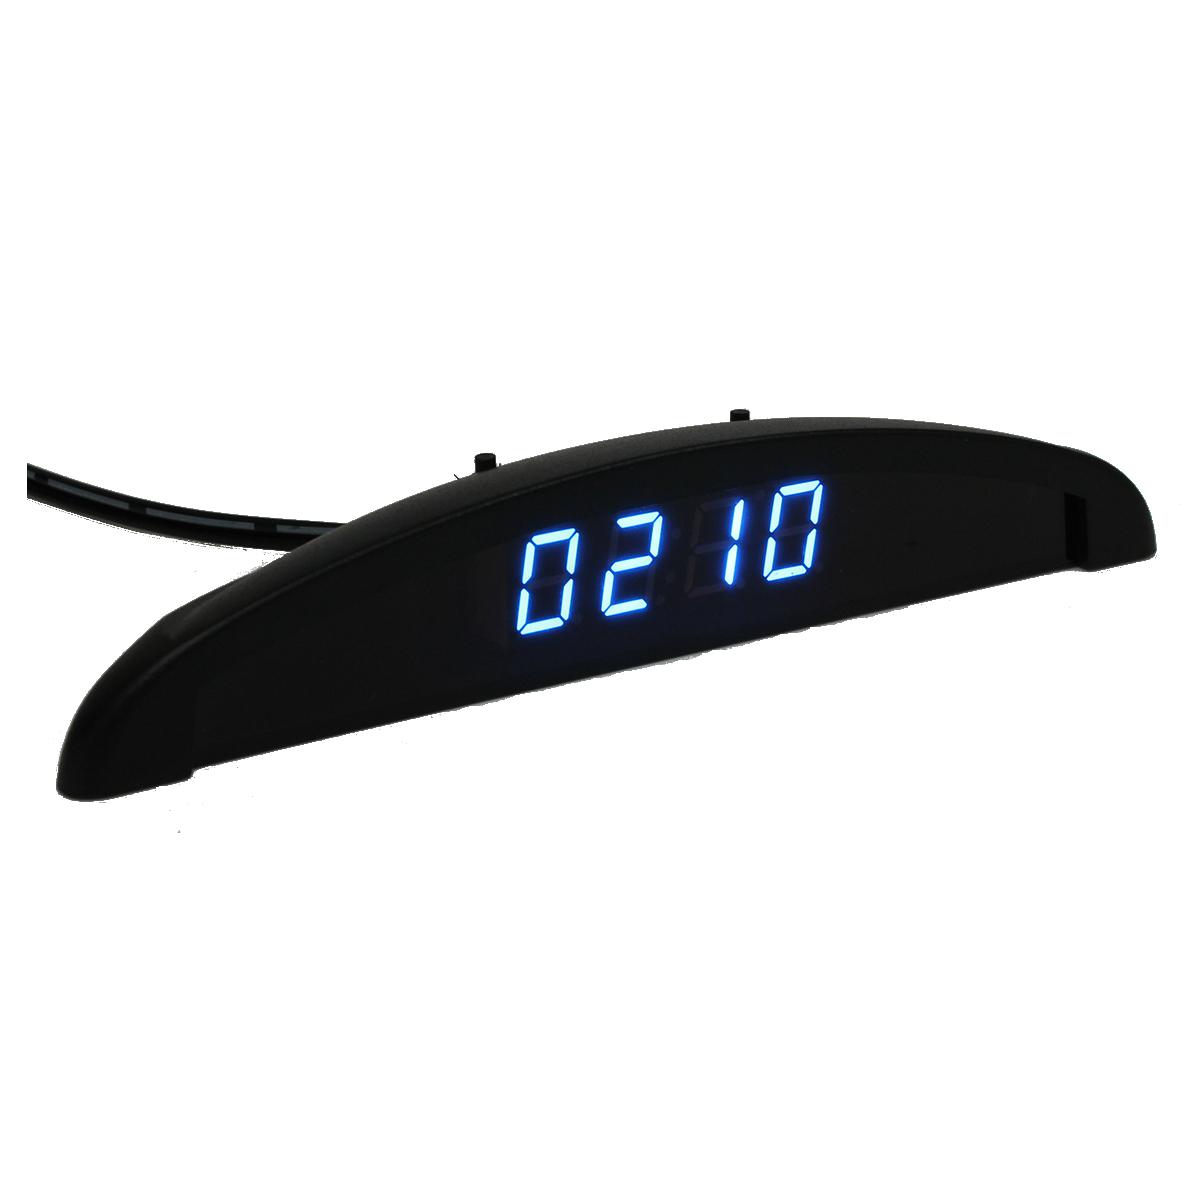 9272fe57daf4 3 en 1 Reloj electronico de LED digital de coche + termometro + voltimetro  CU